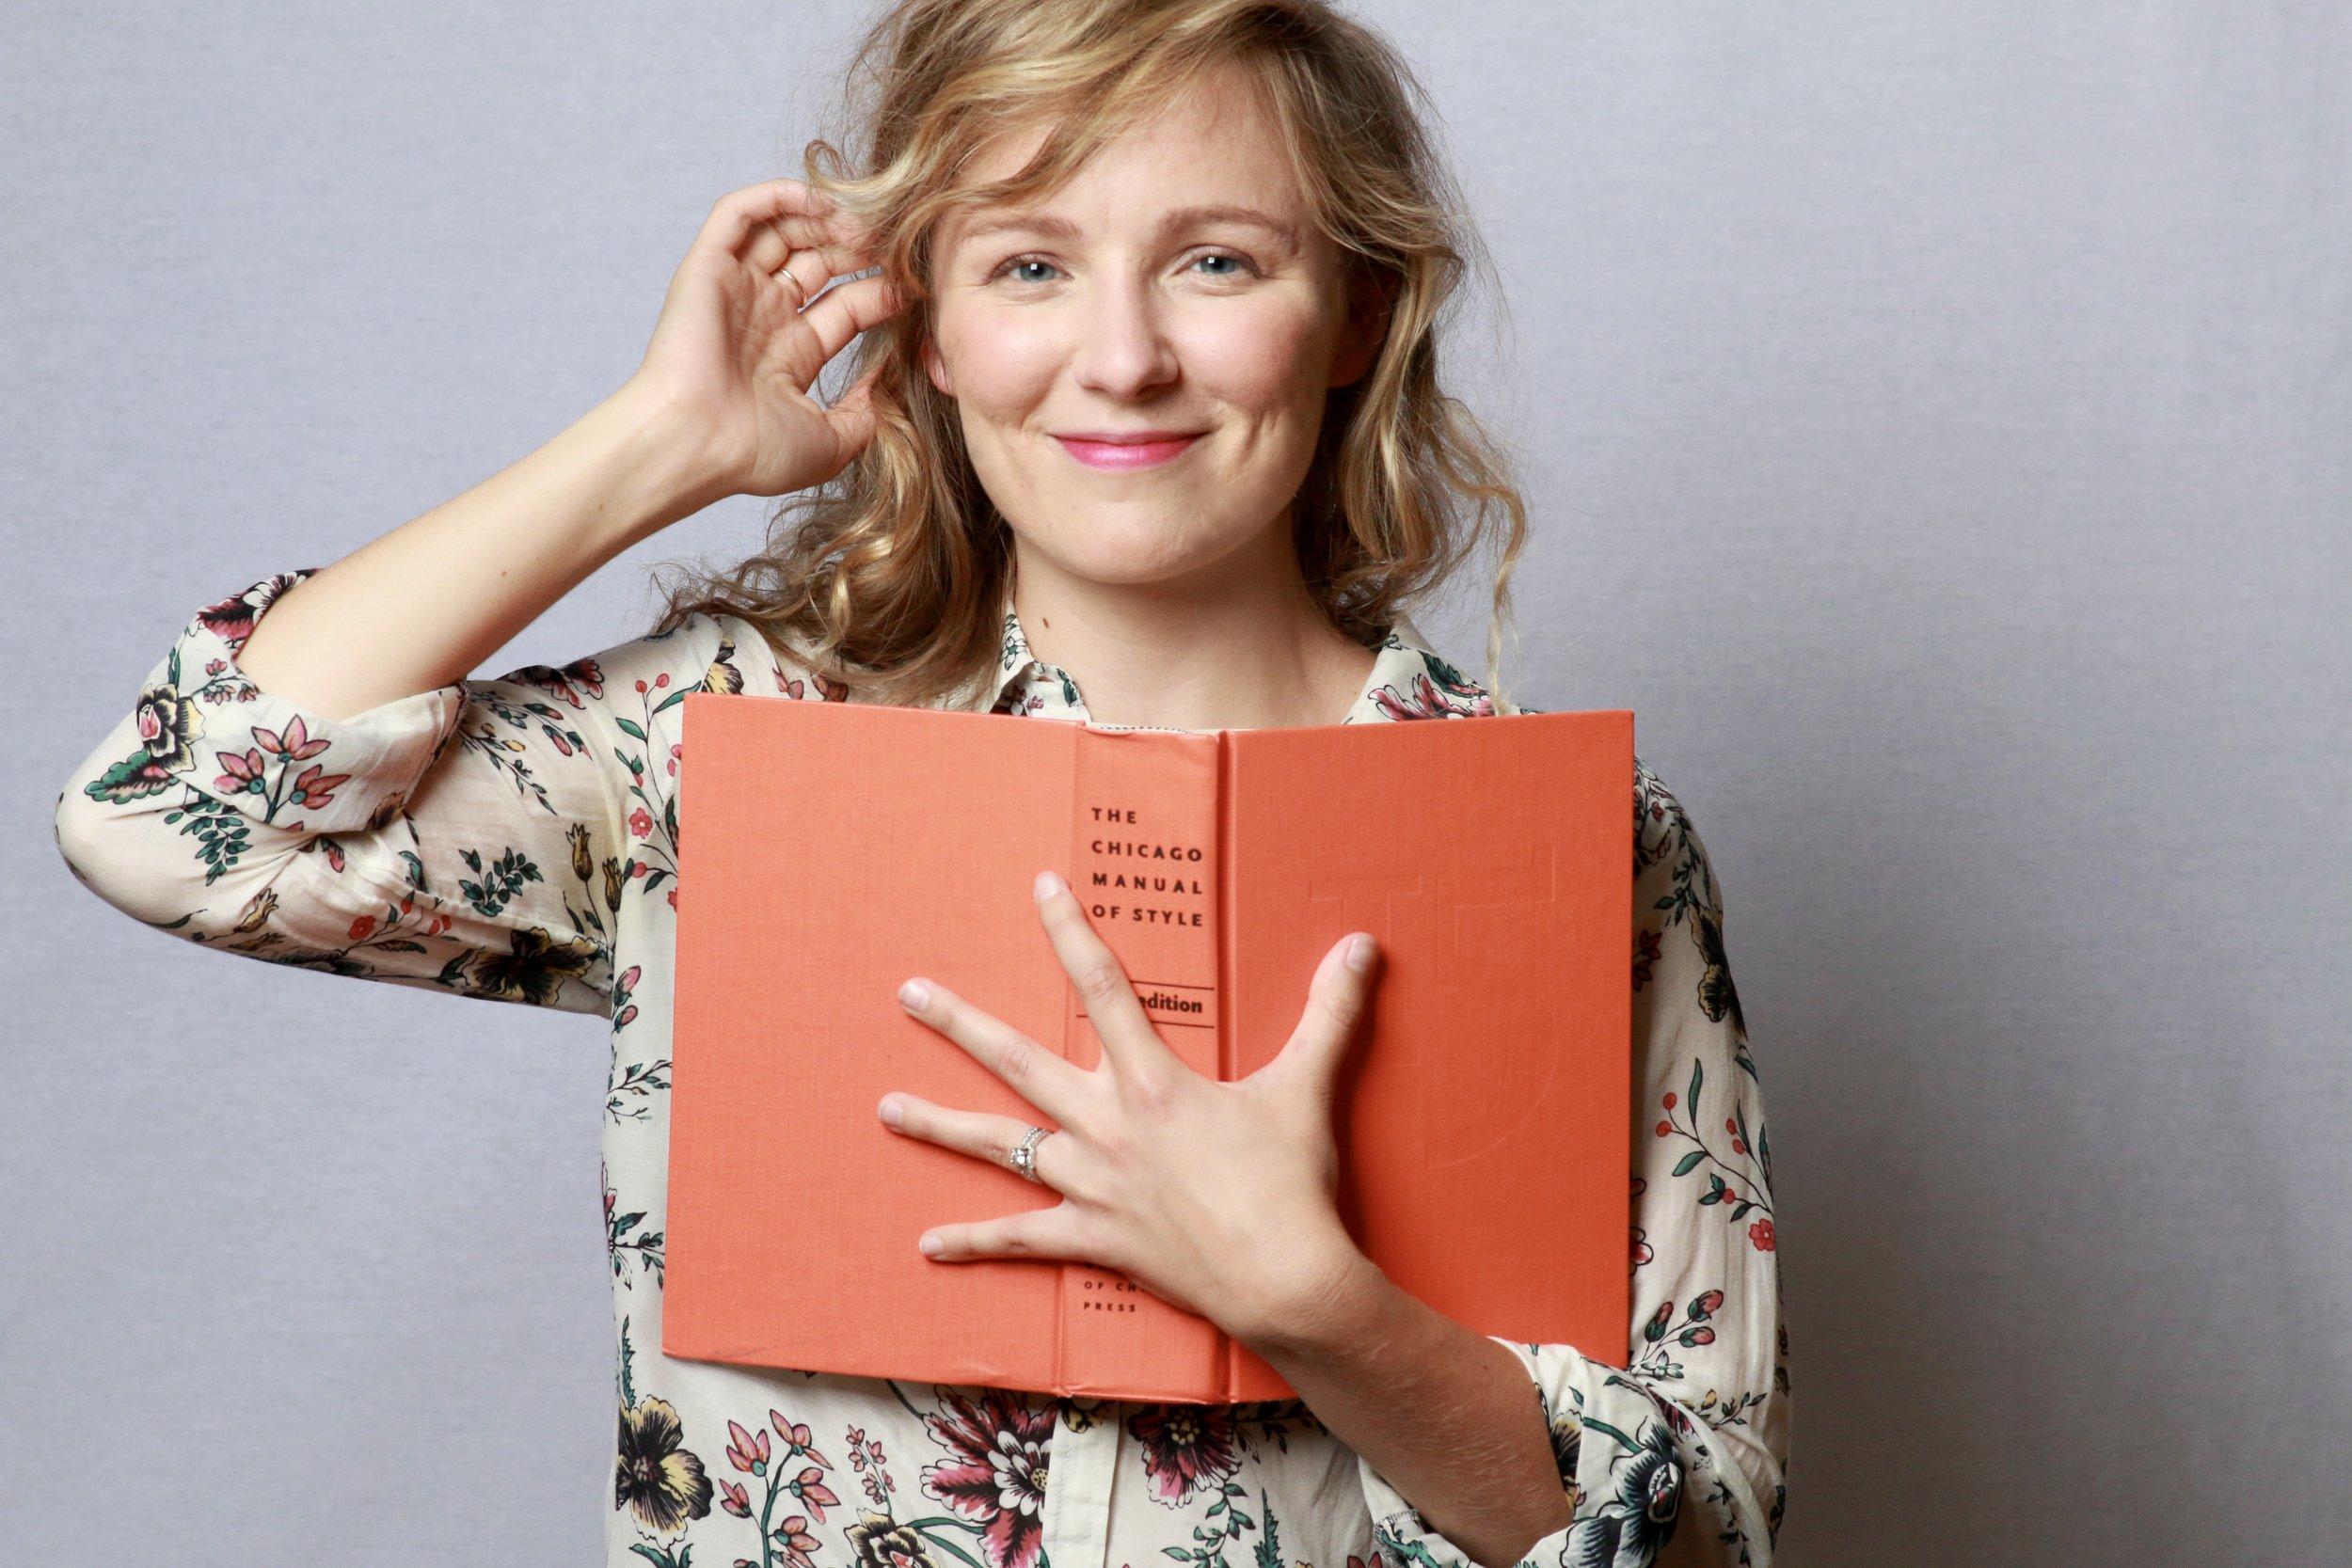 Nashville, Tennessee,Writer and Editor Amanda B. Johnson